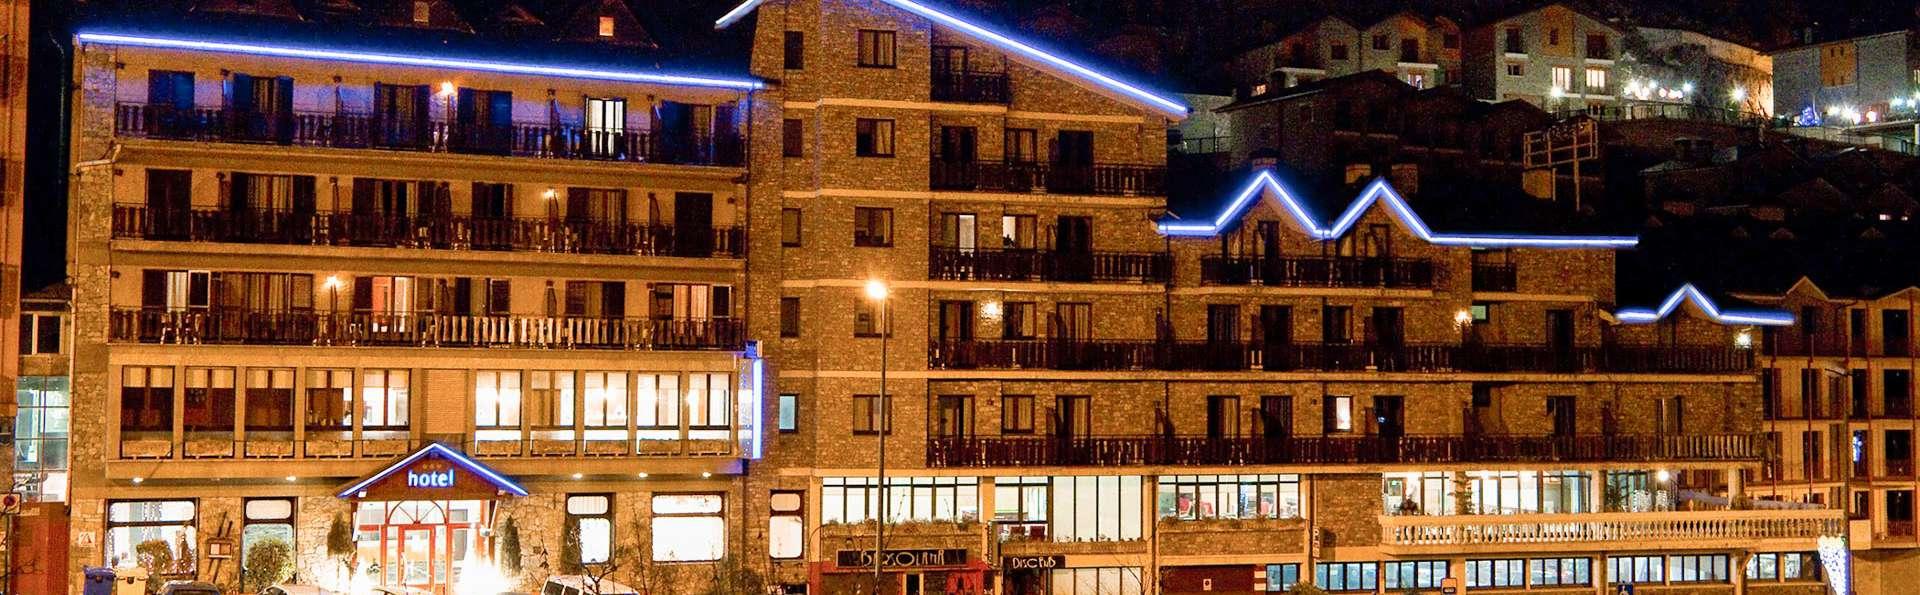 Hotel Solana Arinsal - EDIT_FRONT_01.jpg